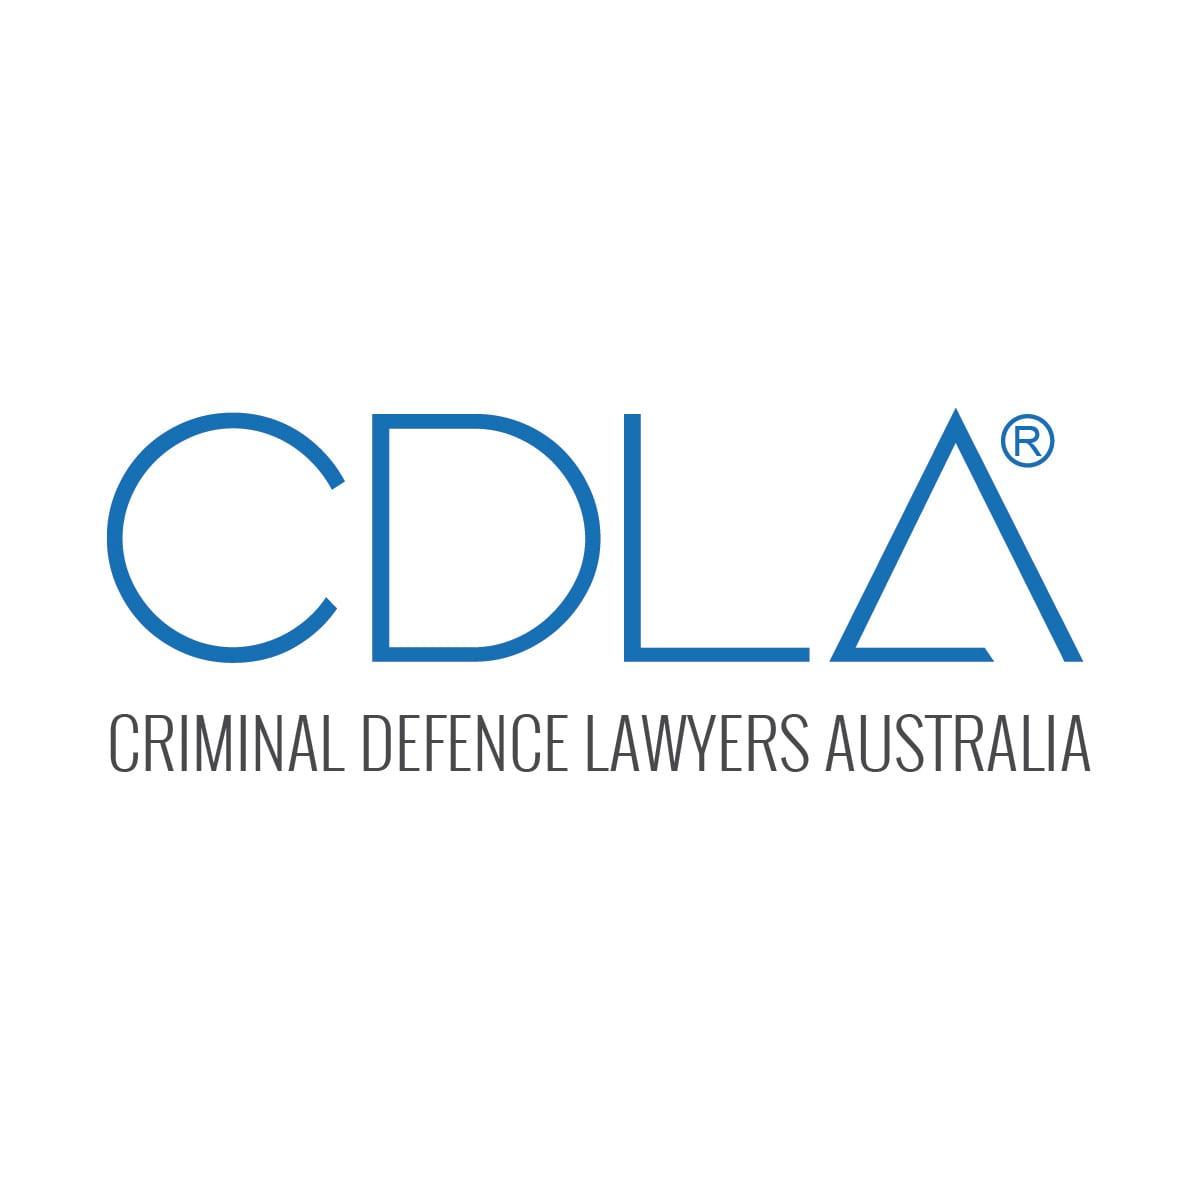 Criminal Defence Lawyers Australia